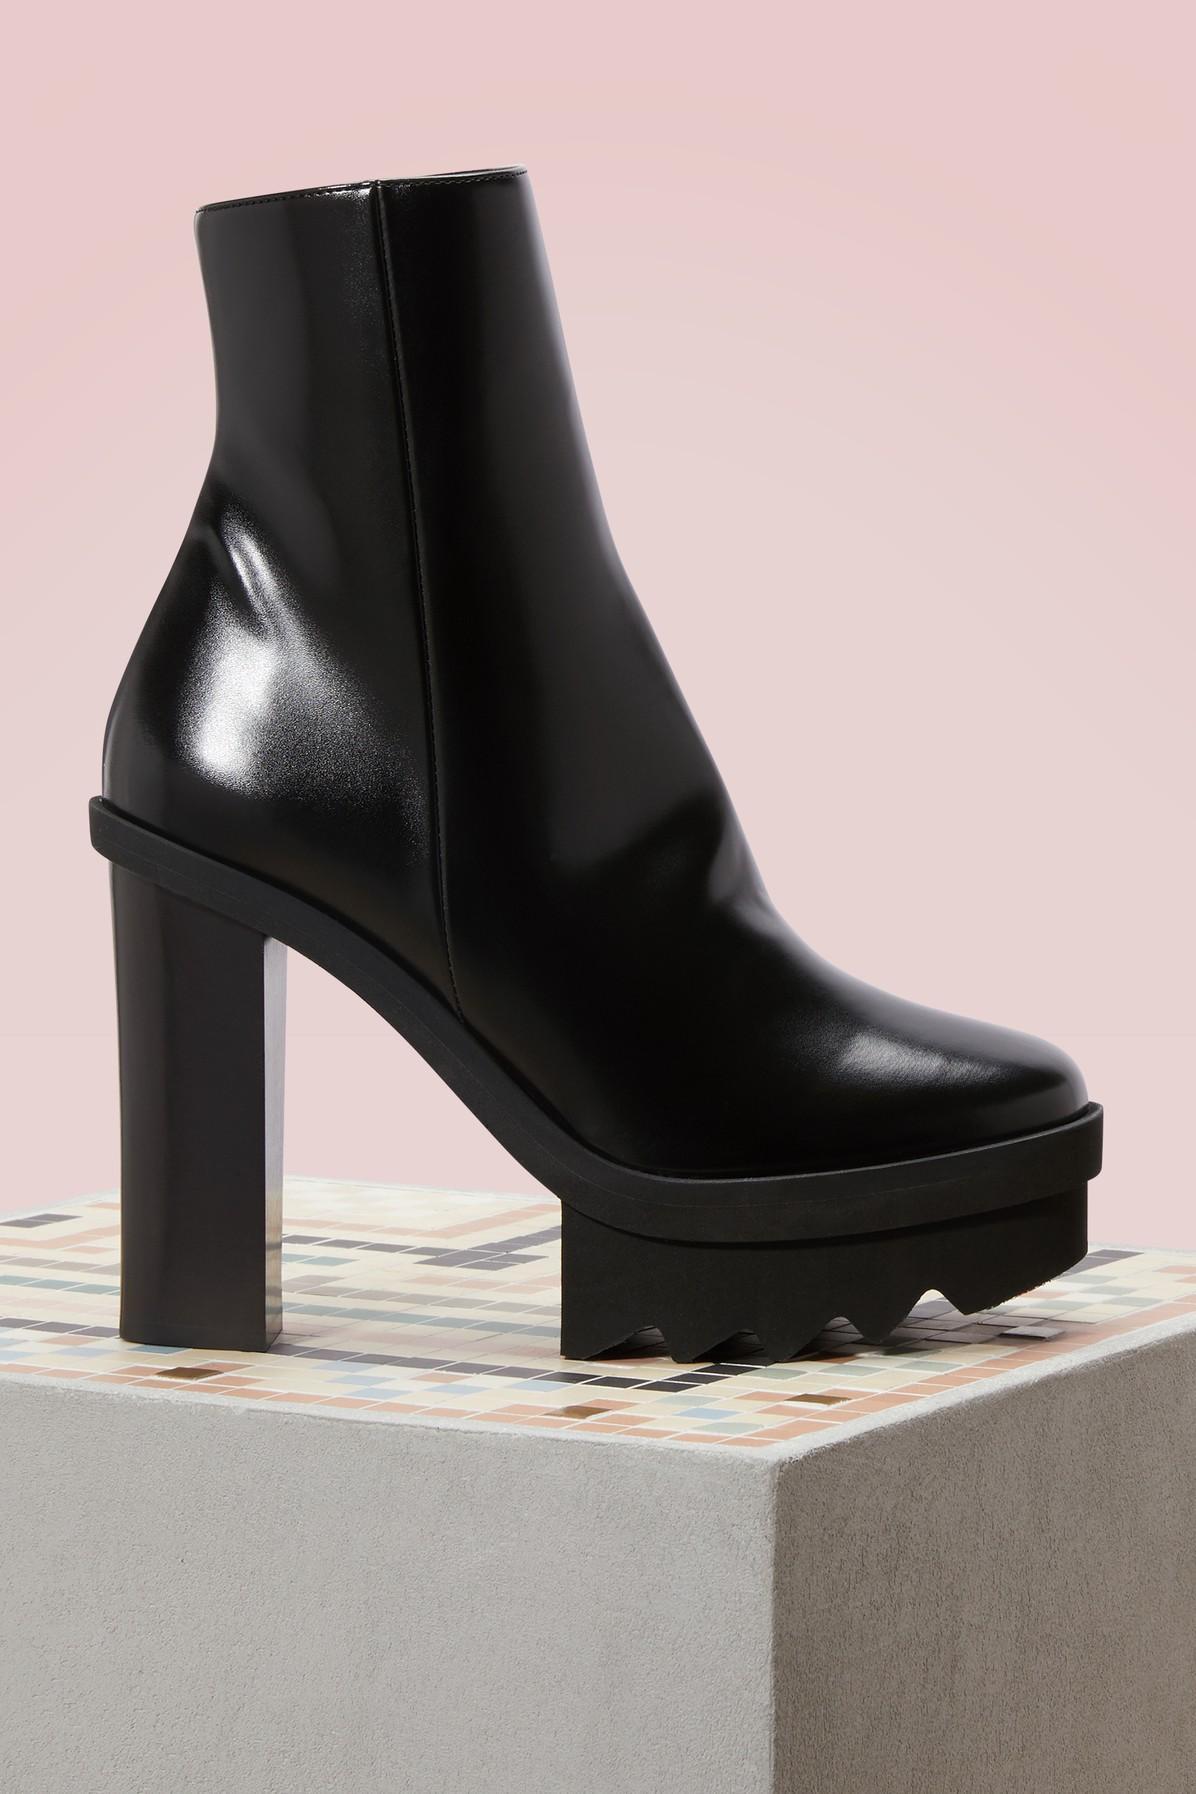 fc2f681efc40 Stella Mccartney Woman Faux Leather Platform Ankle Boots Black In 1000 -  Black